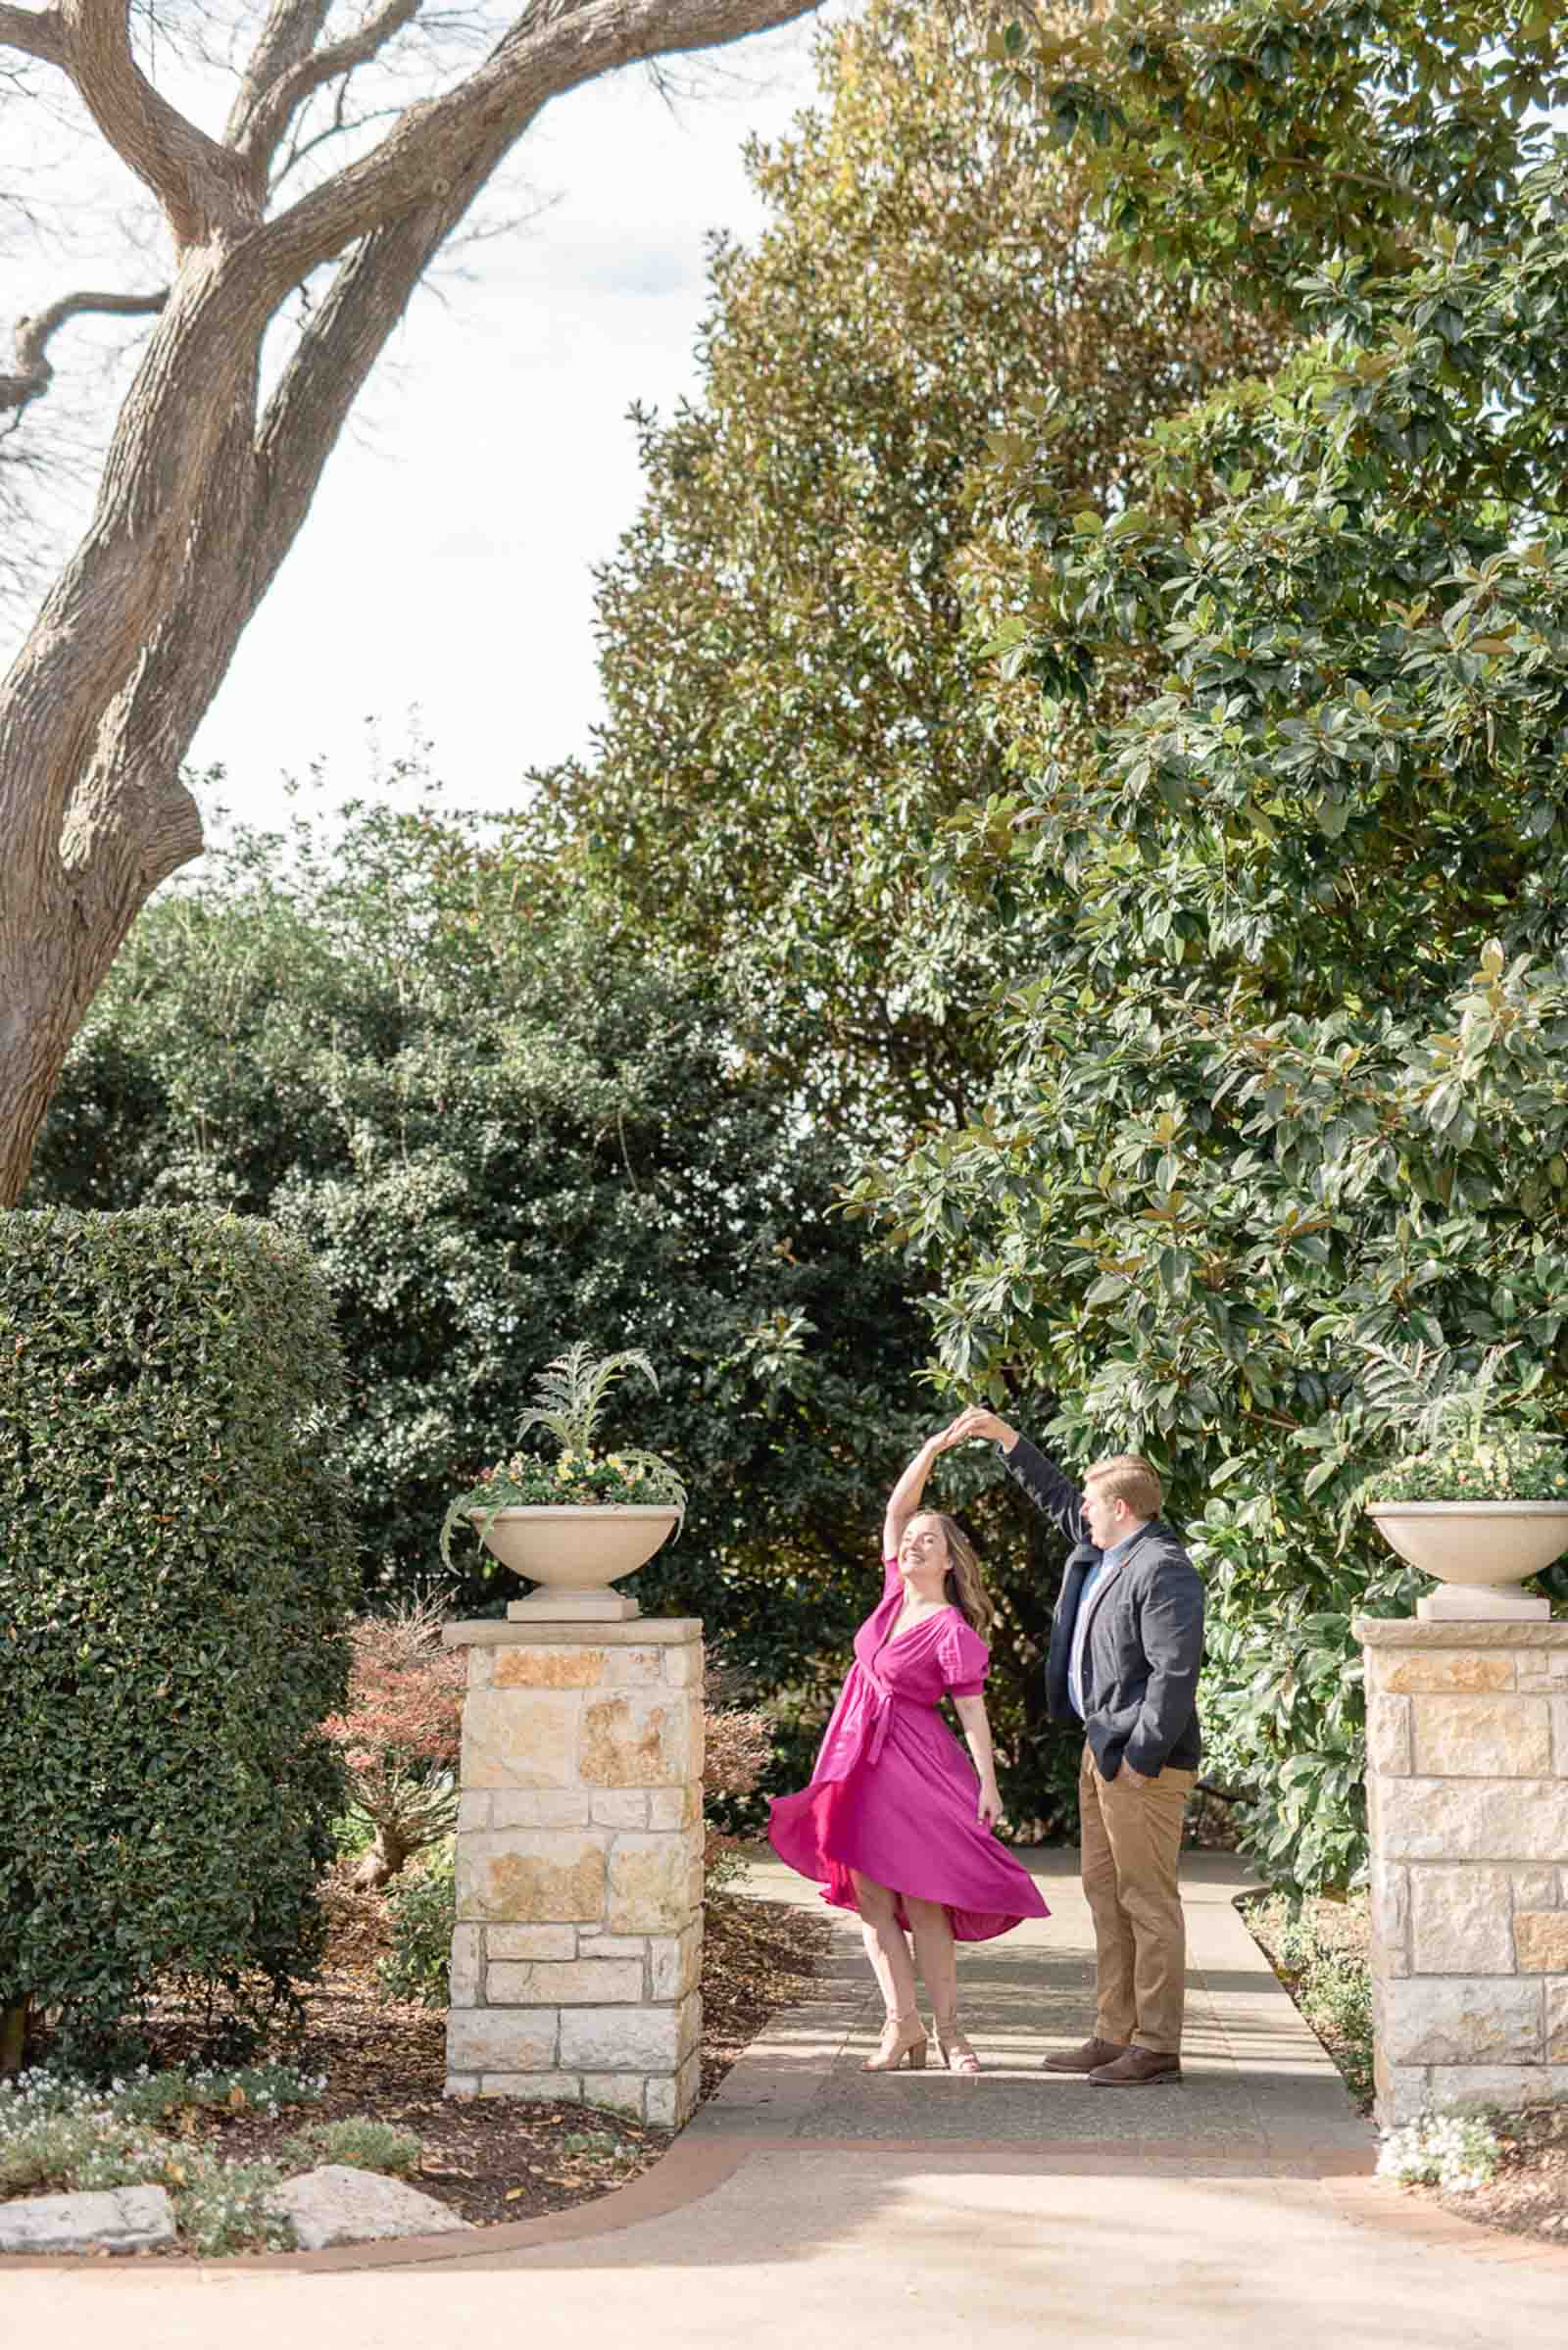 Dallas Arboretum Engagement-JenSymes-76-2.jpg